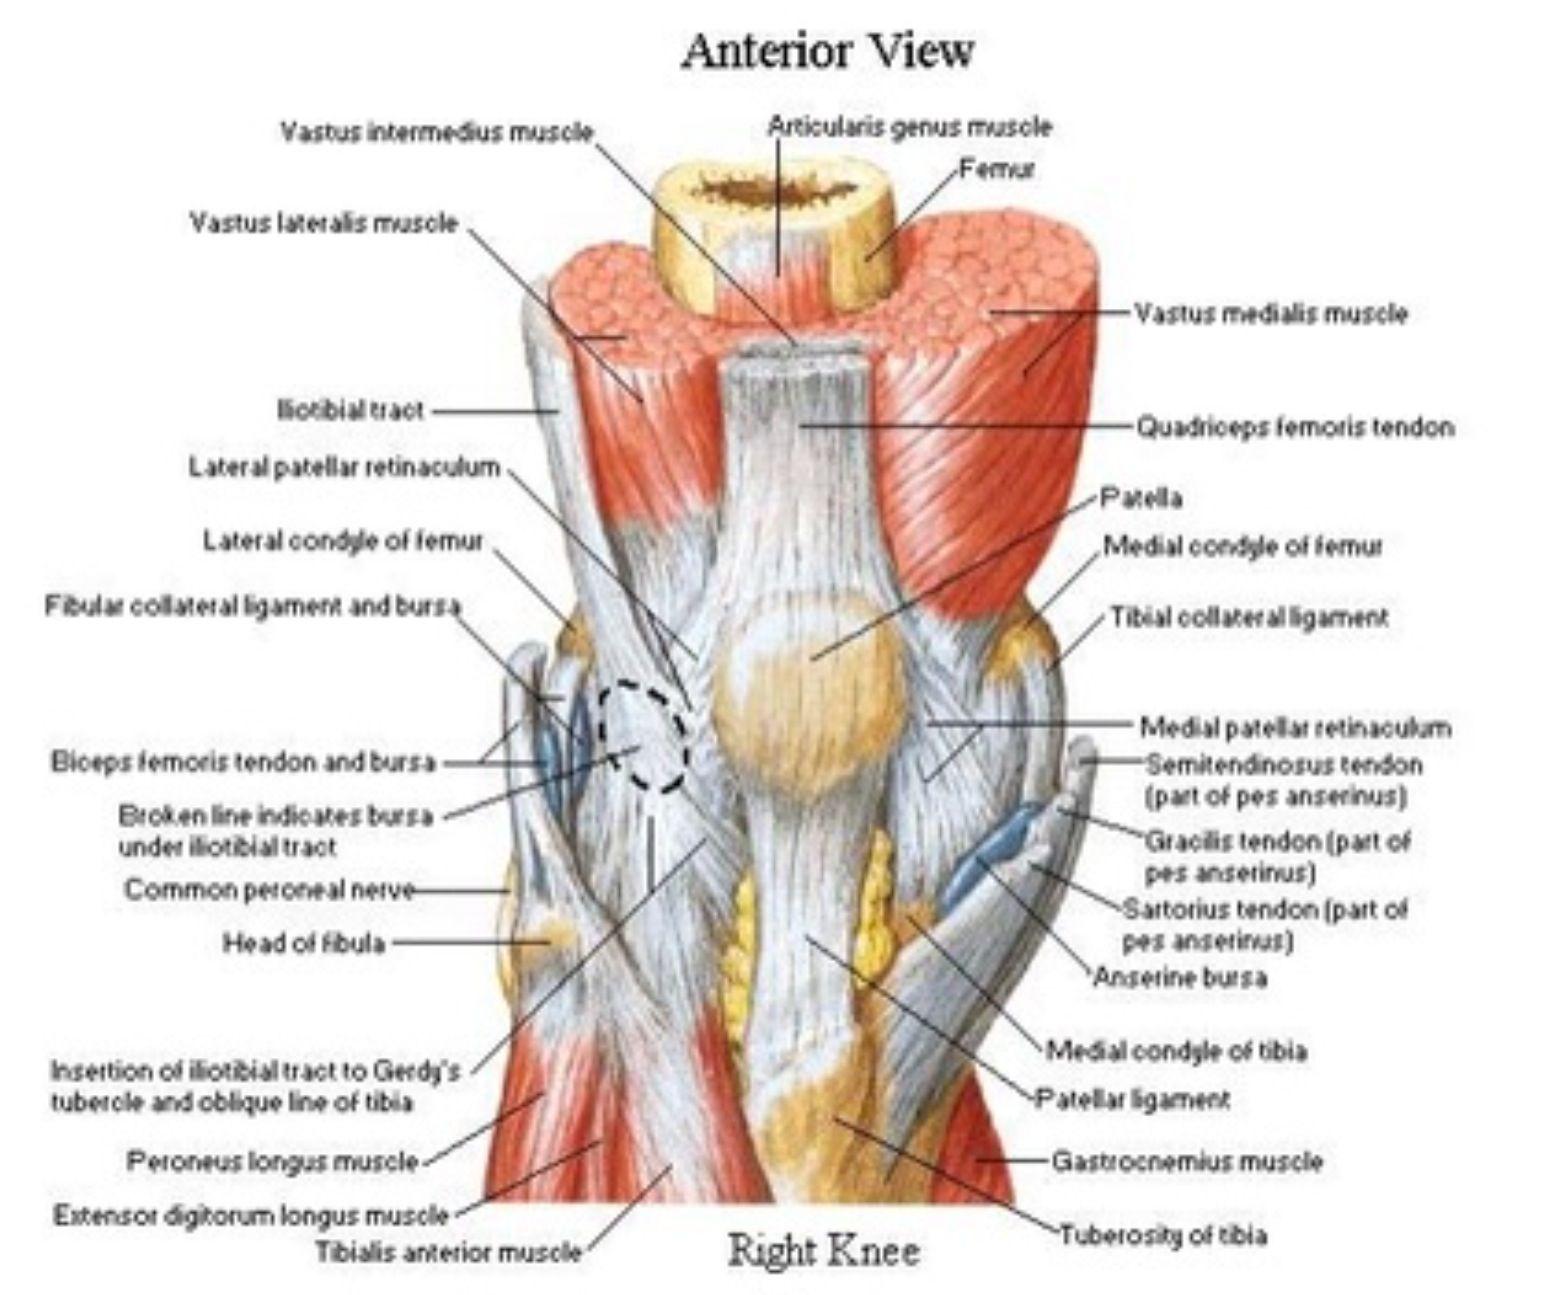 Anterior Aspect Of The Knee Netter Anatomy Pinterest Anatomy